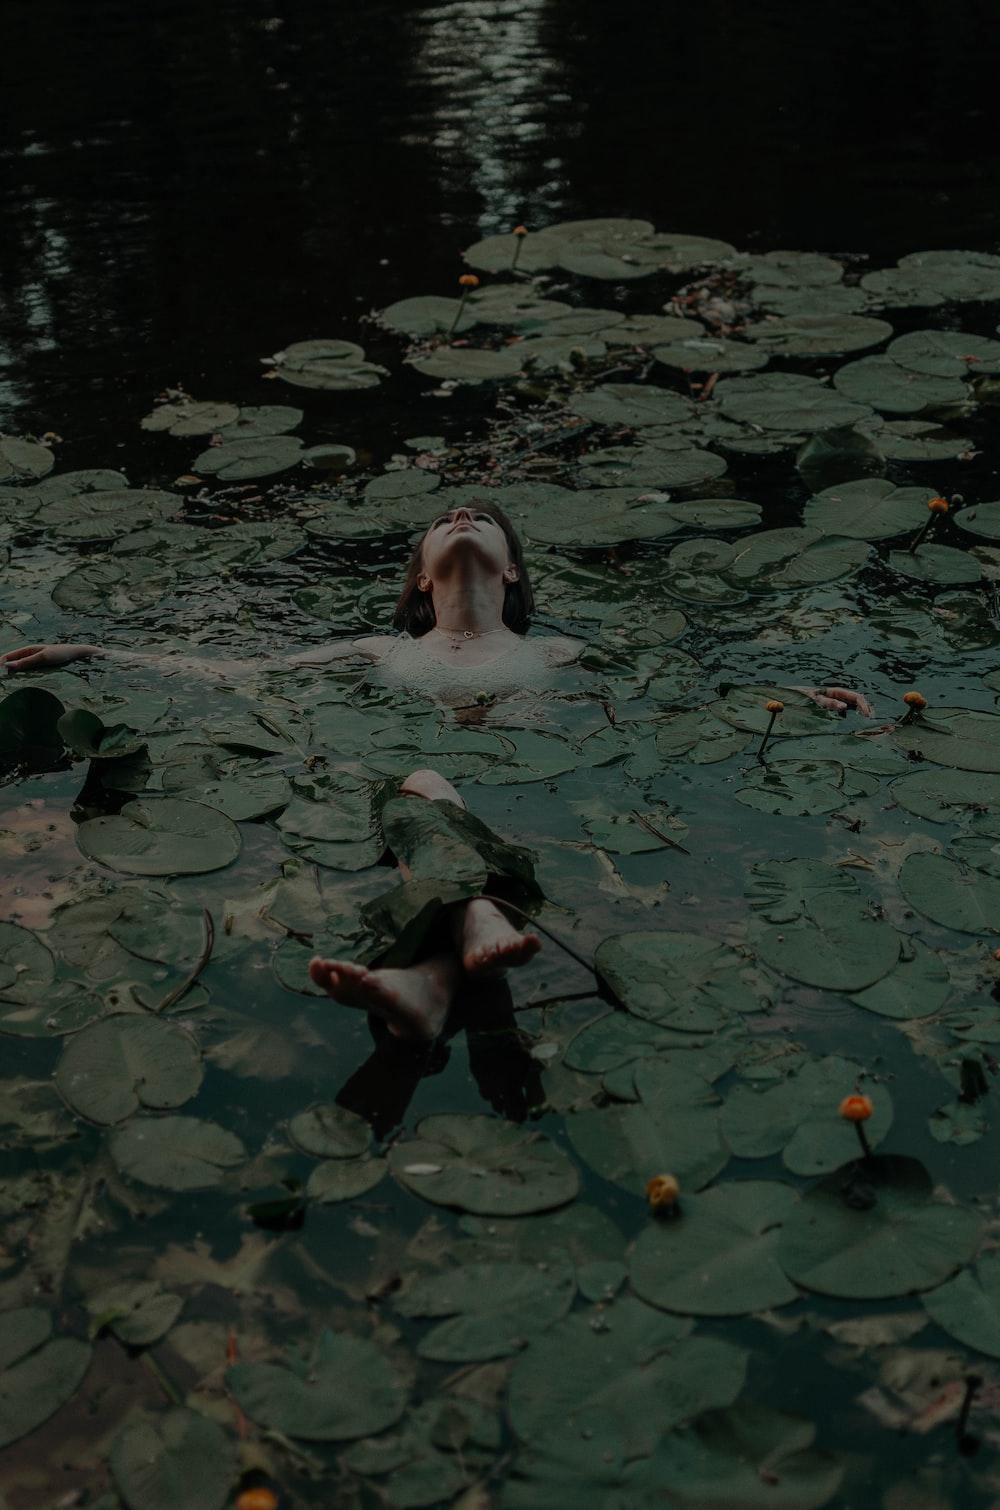 woman lying on body of water